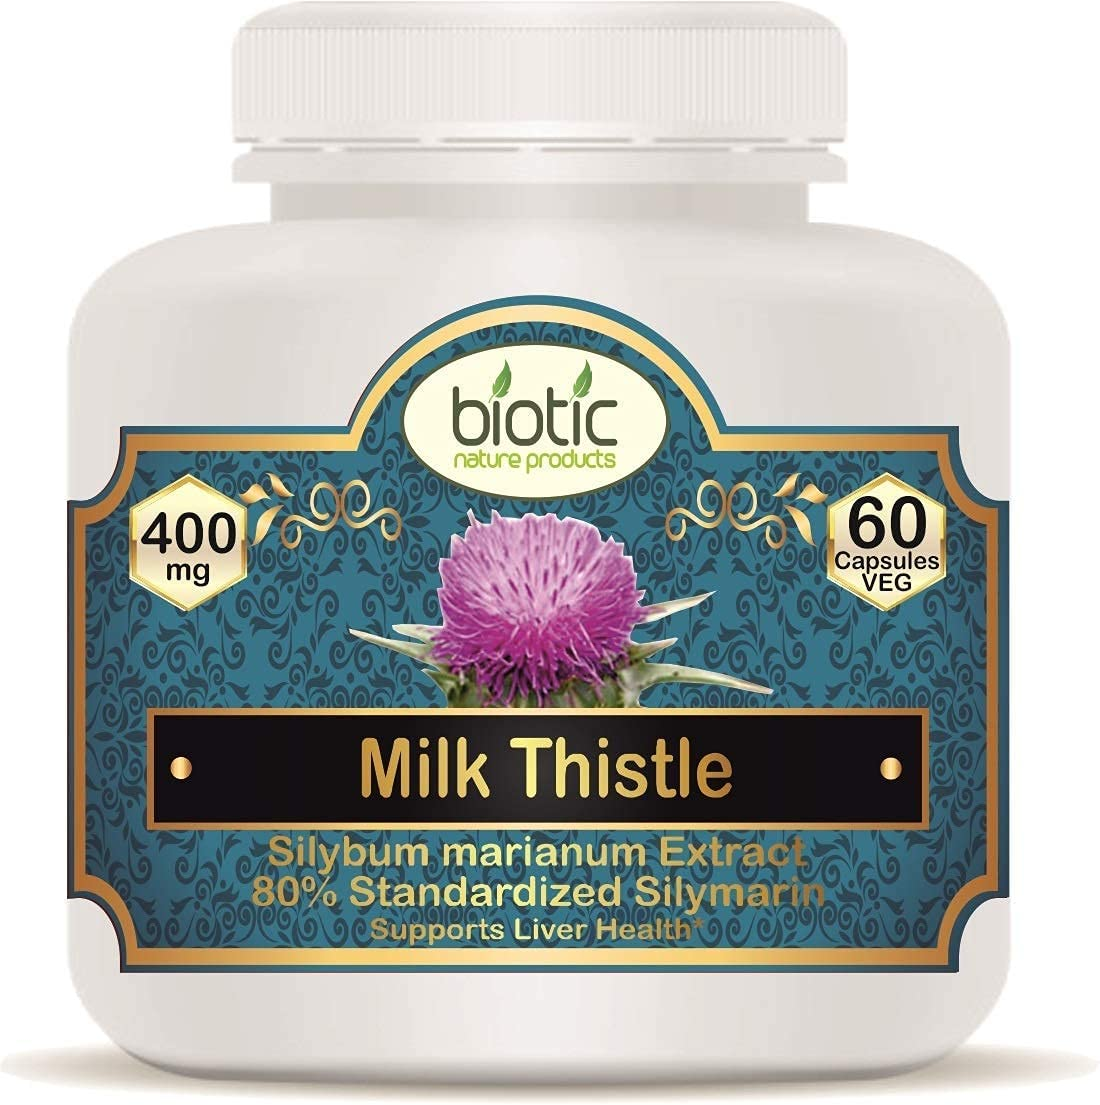 Trisha Biotic Milk Thistle Capsules 400mg Very popular - Max 76% OFF Veg Capsu Extract 60